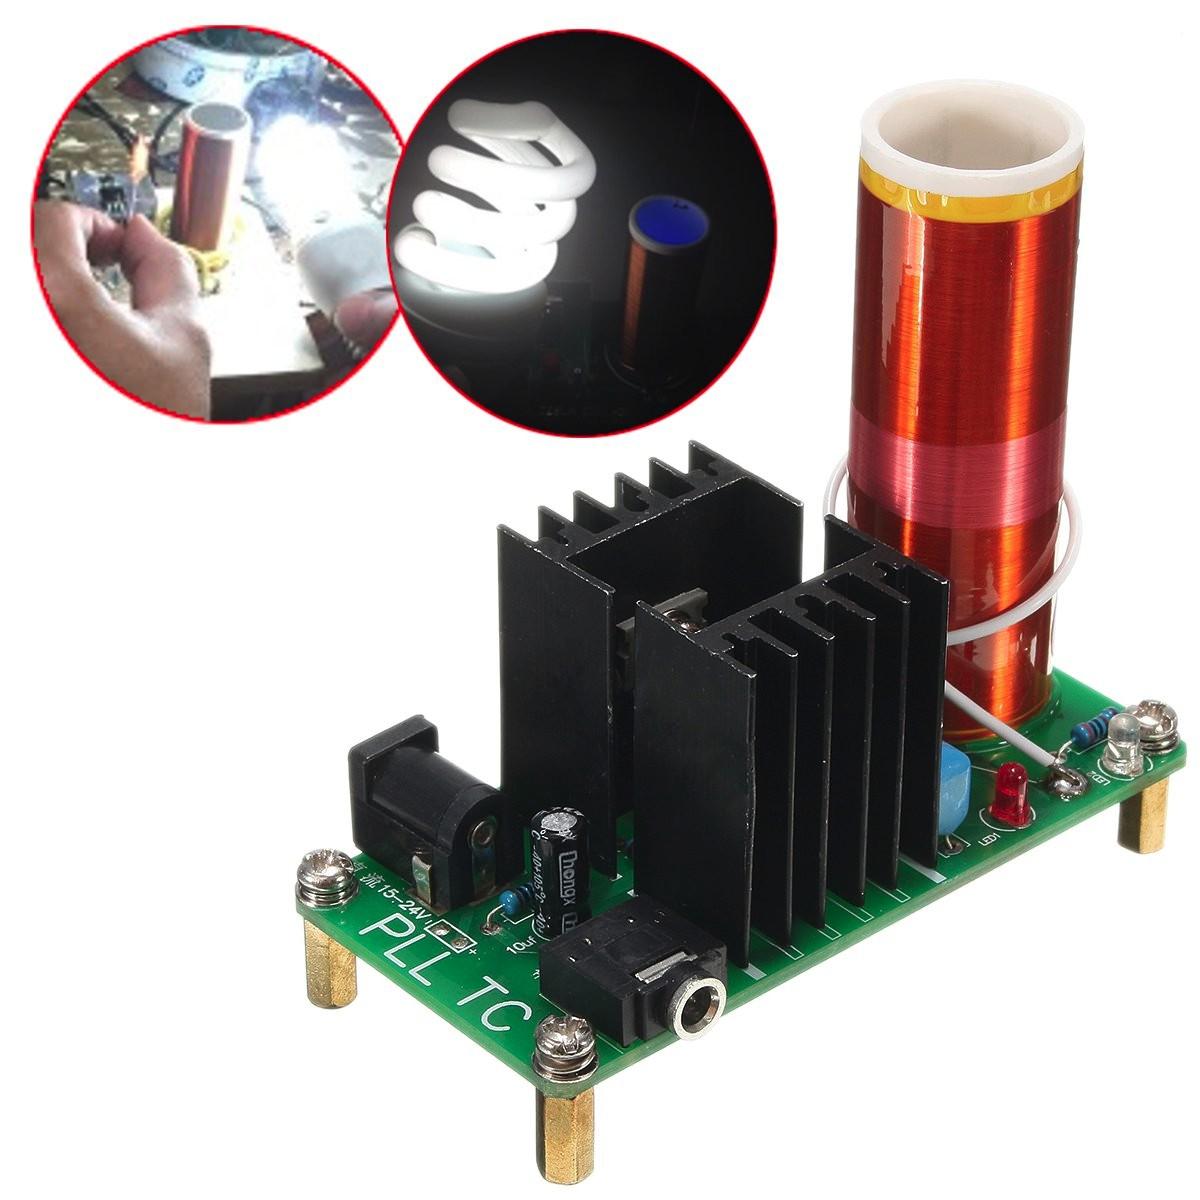 15W Plasma Music Wireless Power Transmission Across Air Horn Lighting For Tesla Coil Module